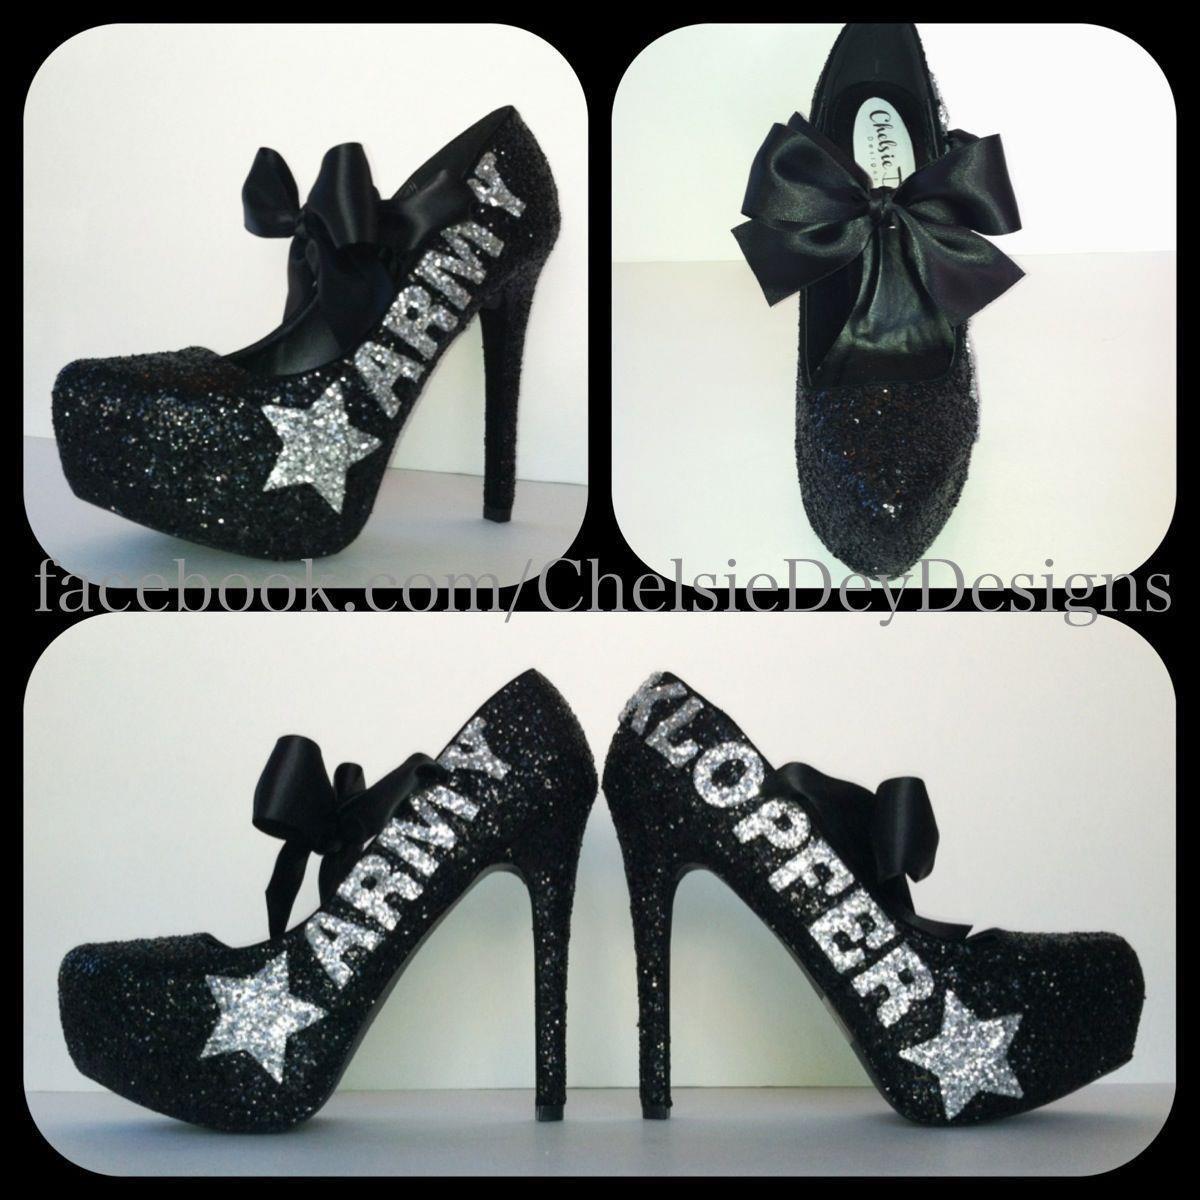 ea7cf2de8ba Black and Silver U.S. Army Last Name Star Glitter Pump High Heels with  Satin Bows